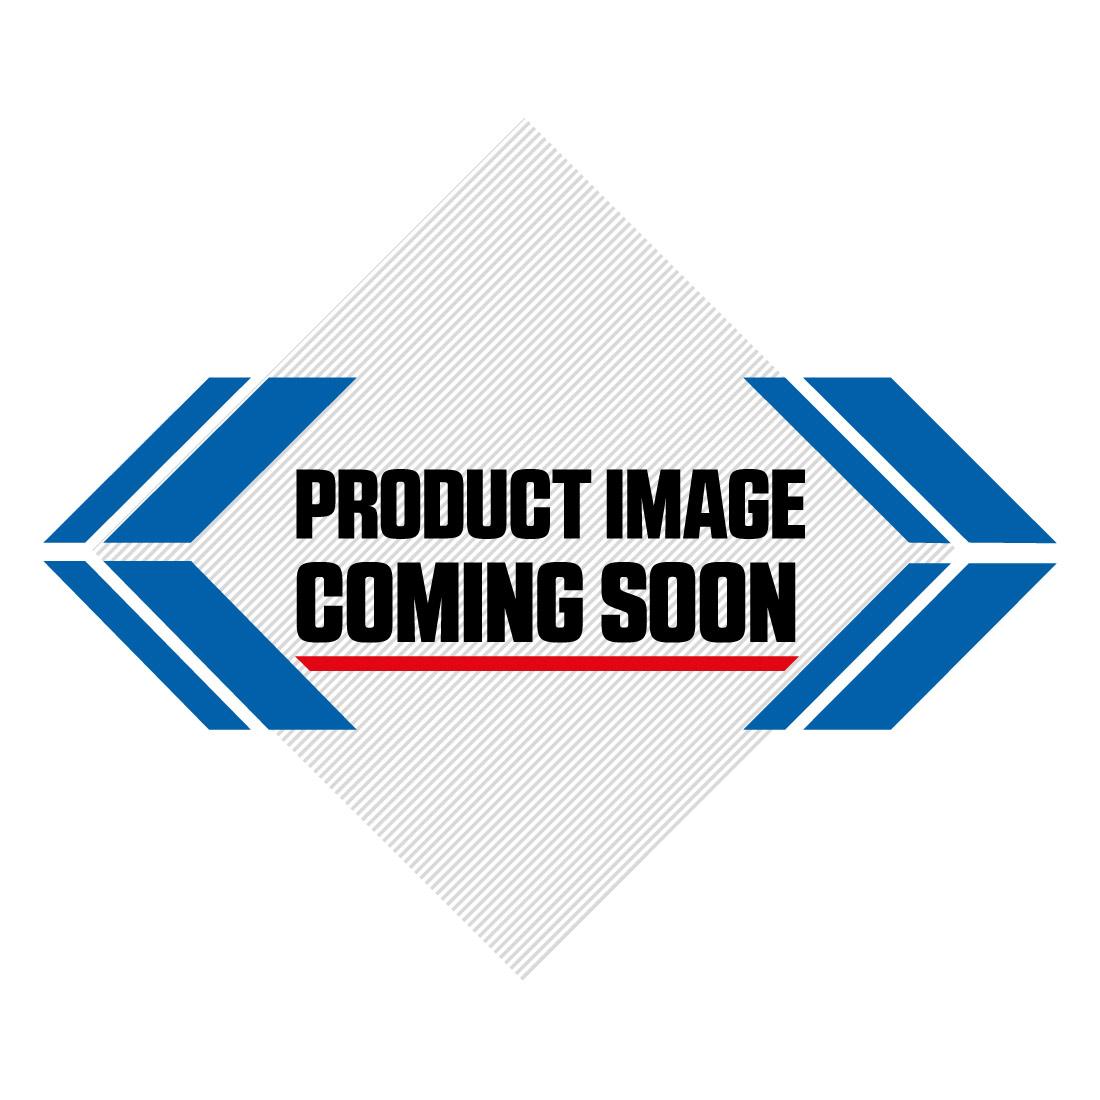 Suzuki Plastic Kit RMZ 450 (11-12) OEM Factory Image-0